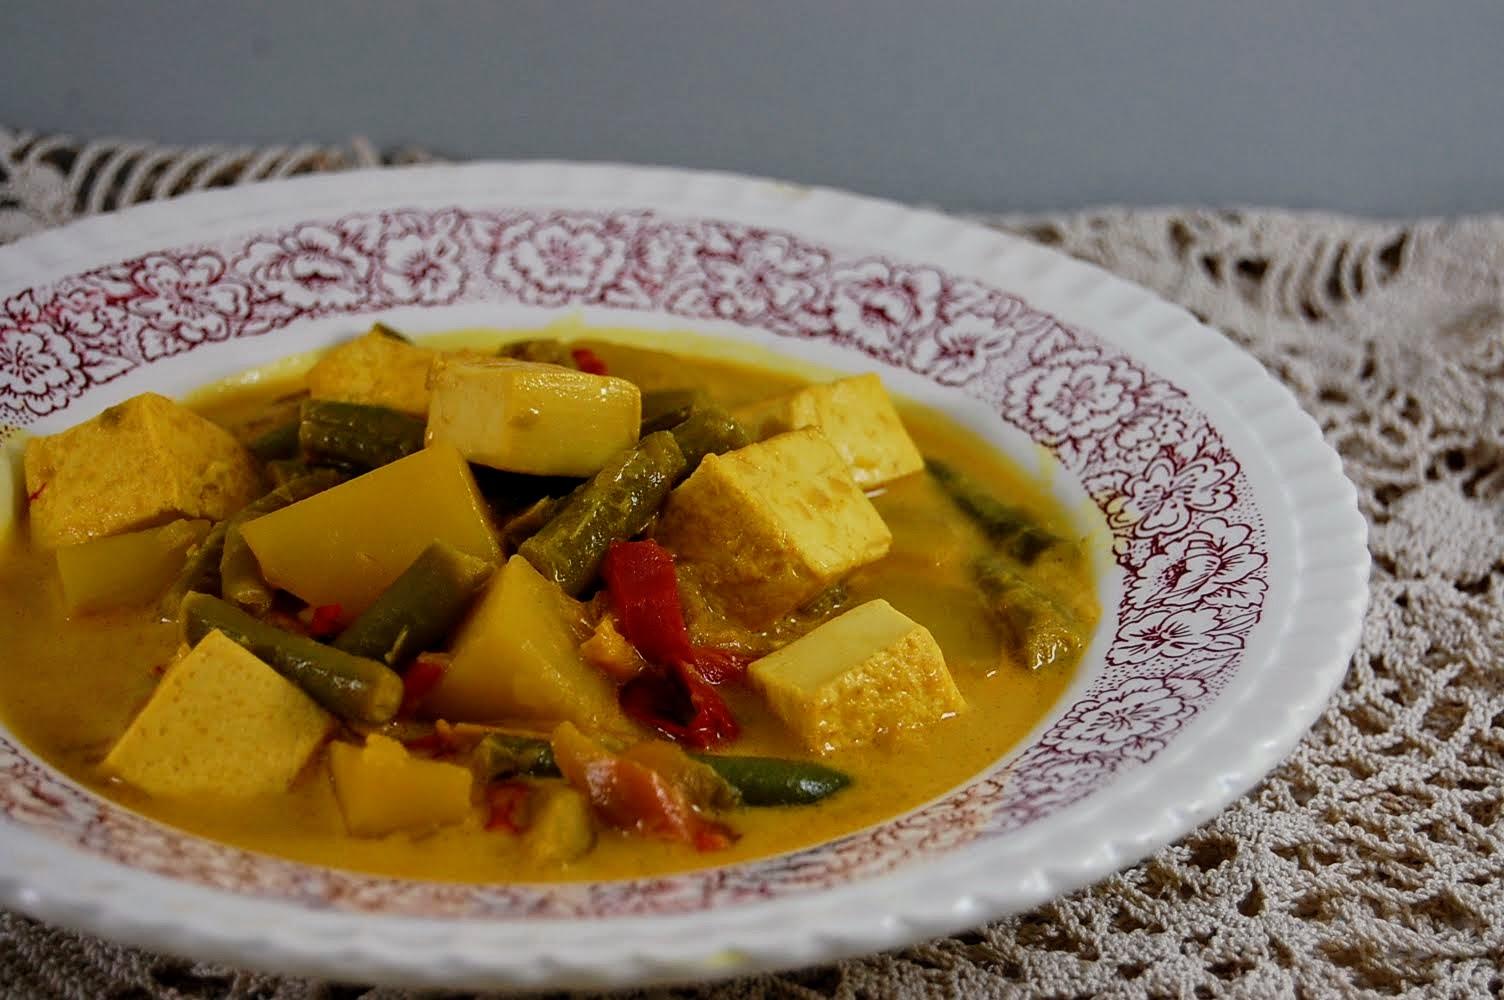 Rezept asiatisch Vegan Kurkuma Eintopf mit Tofu, Bohnen, Kartoffeln